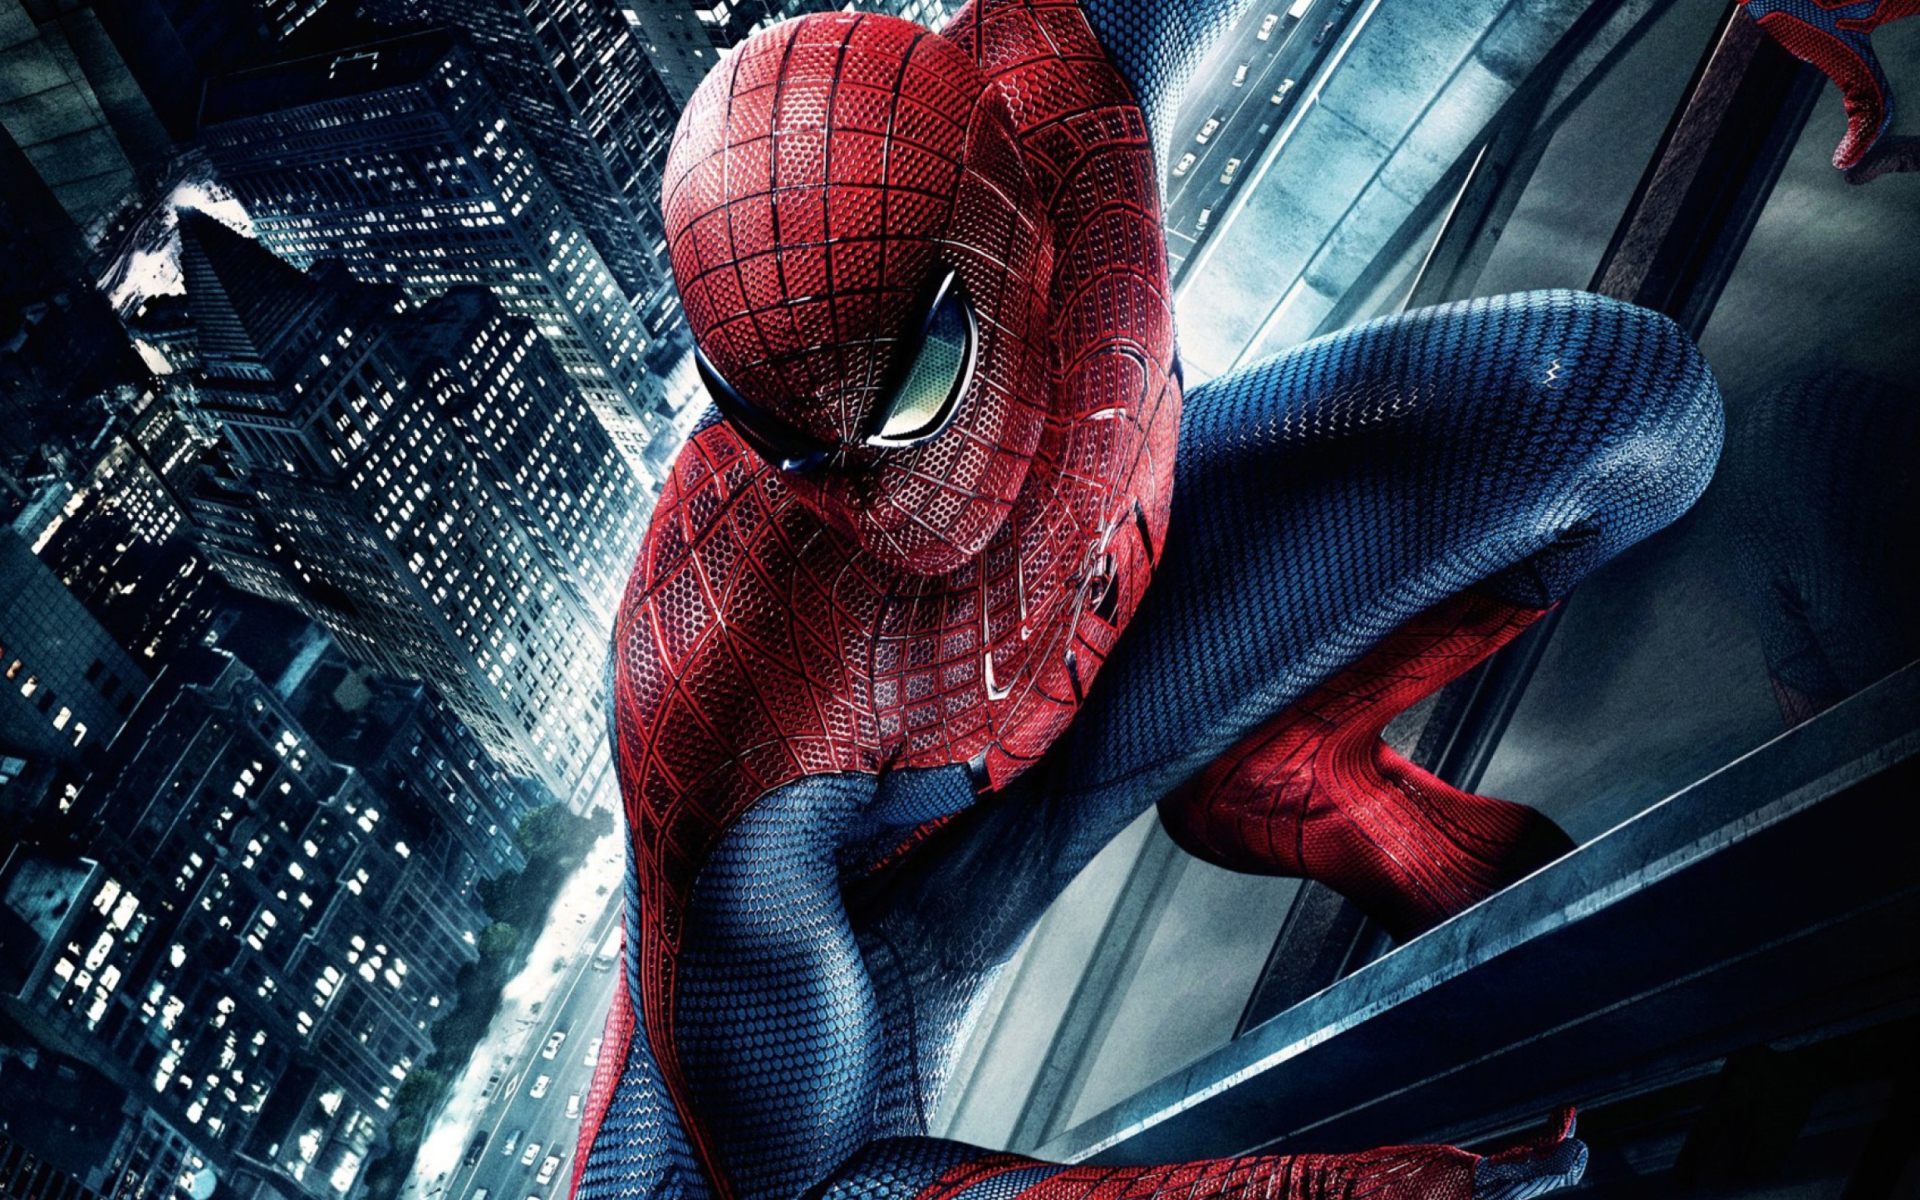 край картинки про человек паука бы